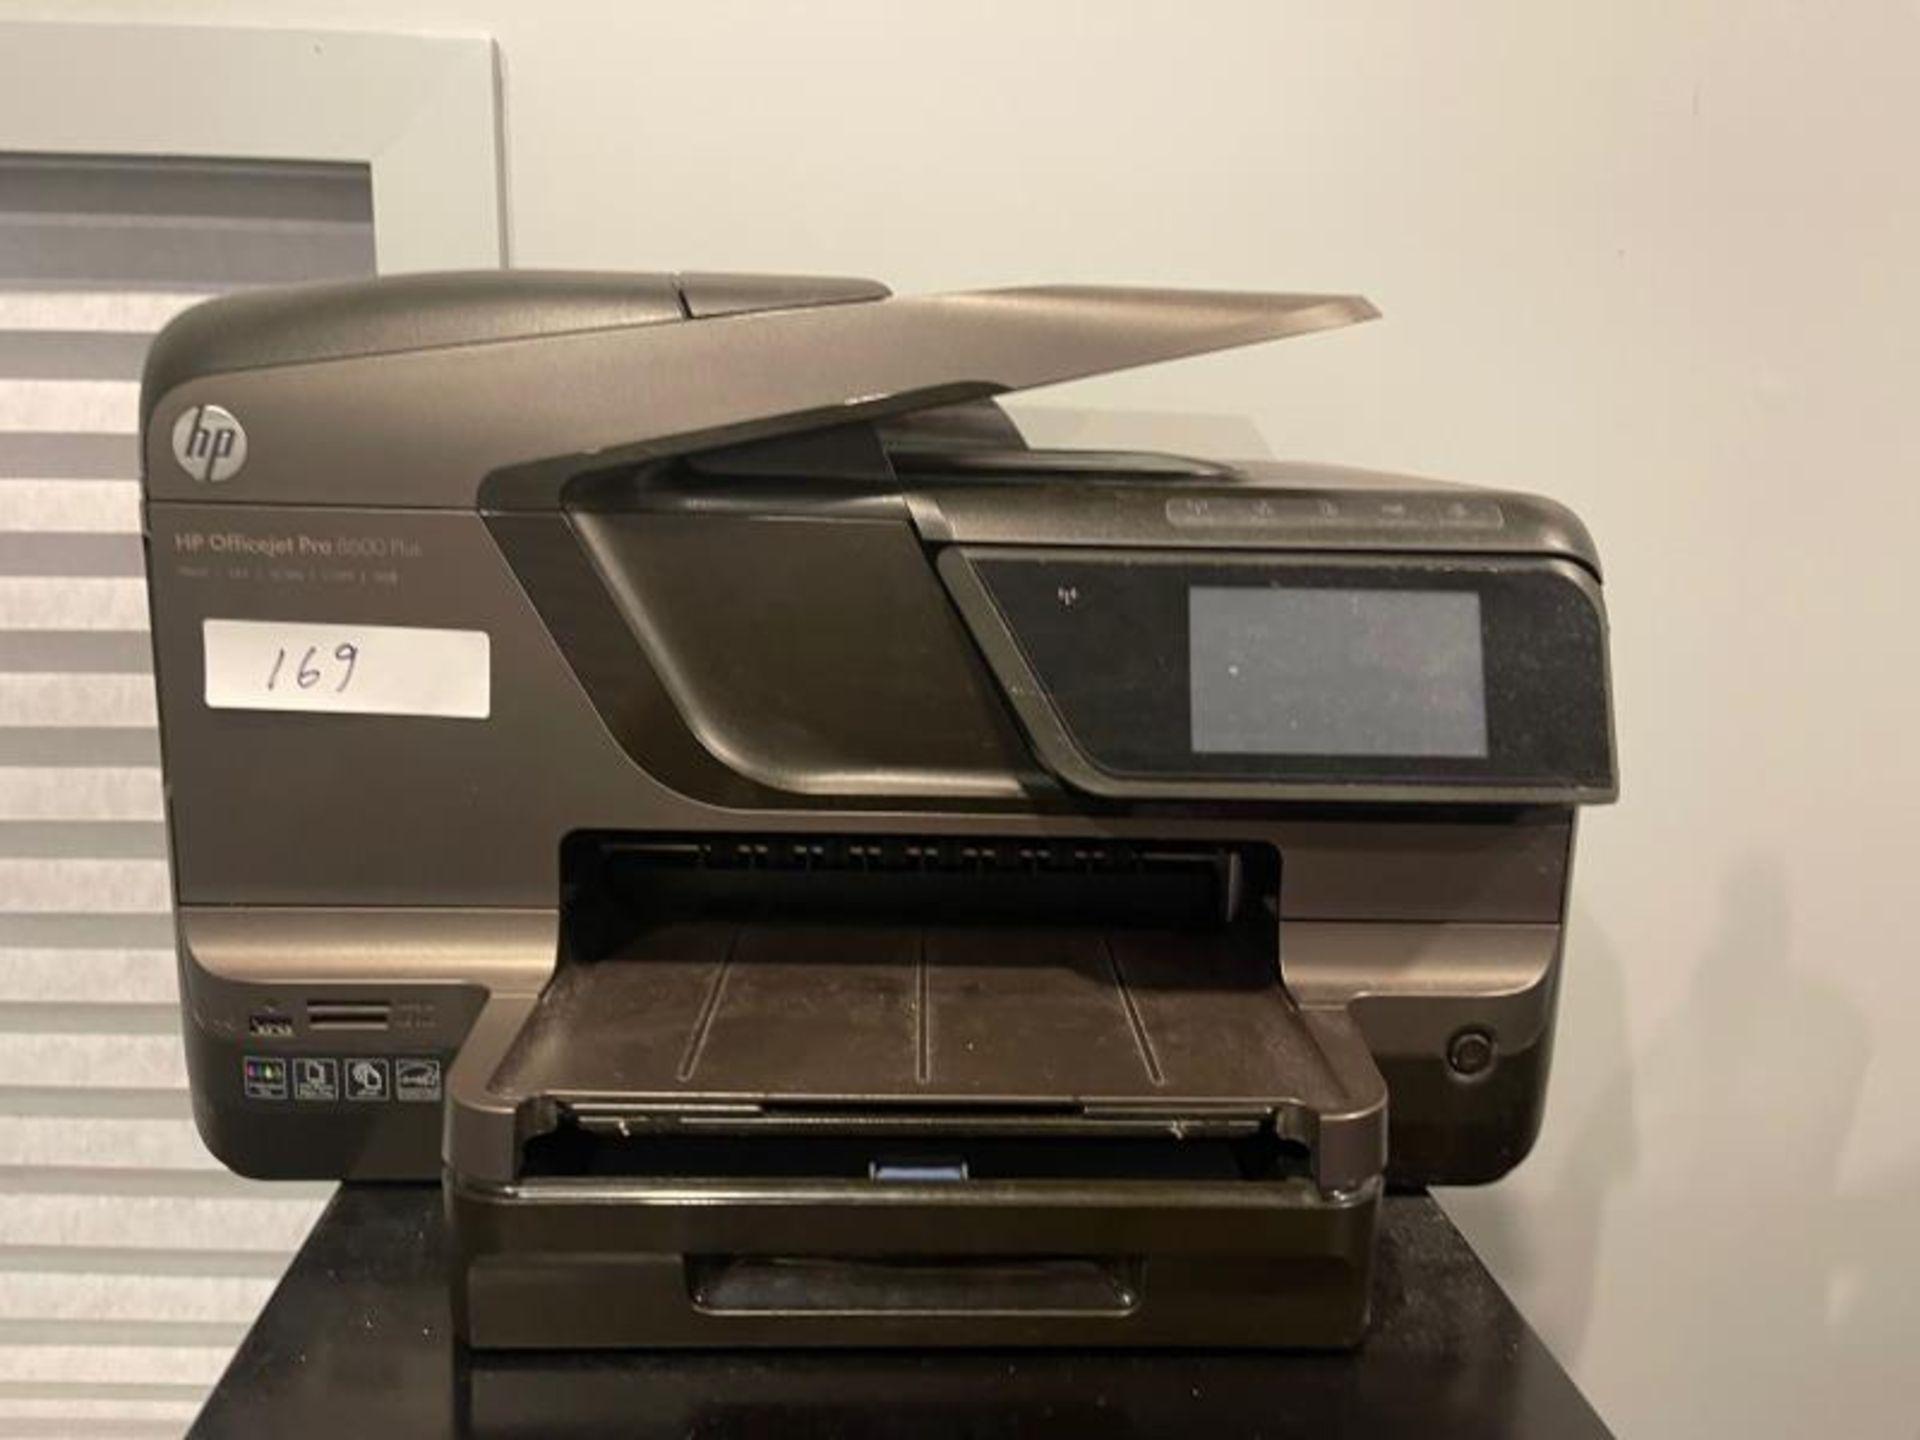 HP Officejet Pro 8600 Plus, no cartridges